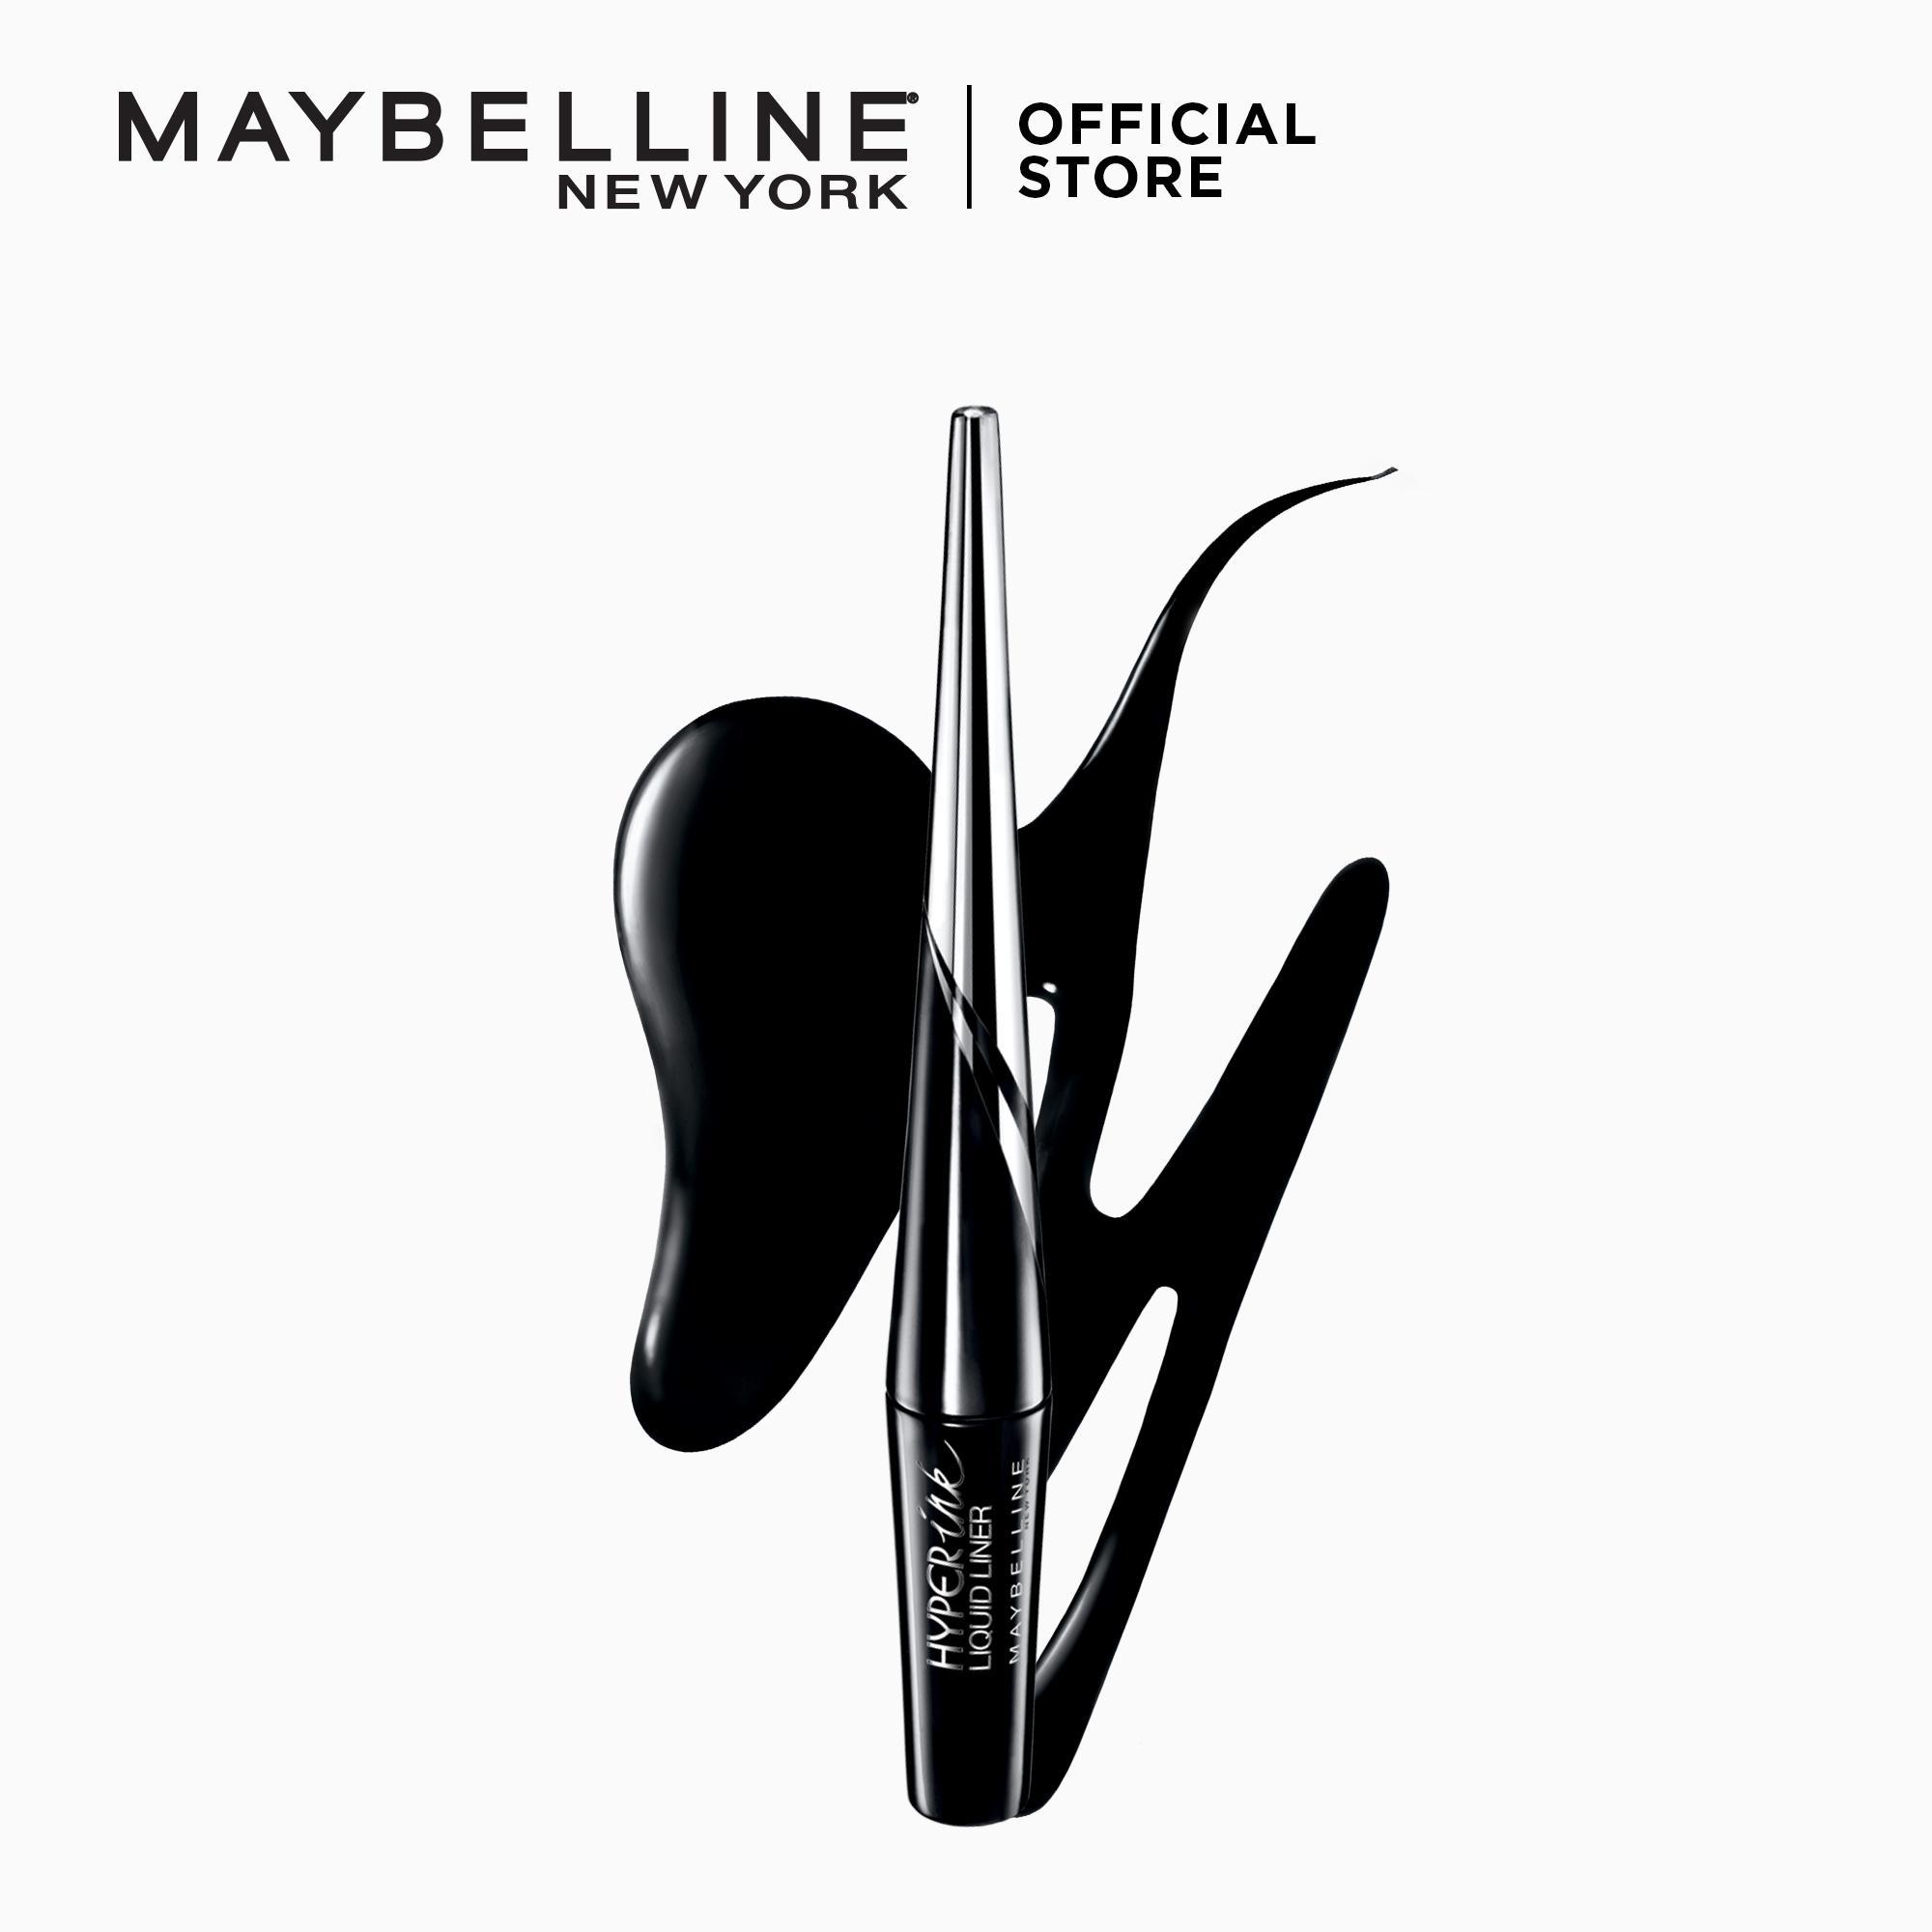 Kajal Brands Eye Liner On Sale Prices Set Reviews In Maybelline Hyper Ink Liquid Hyperink Dip Pen Eyeliner Black Easy To Use By